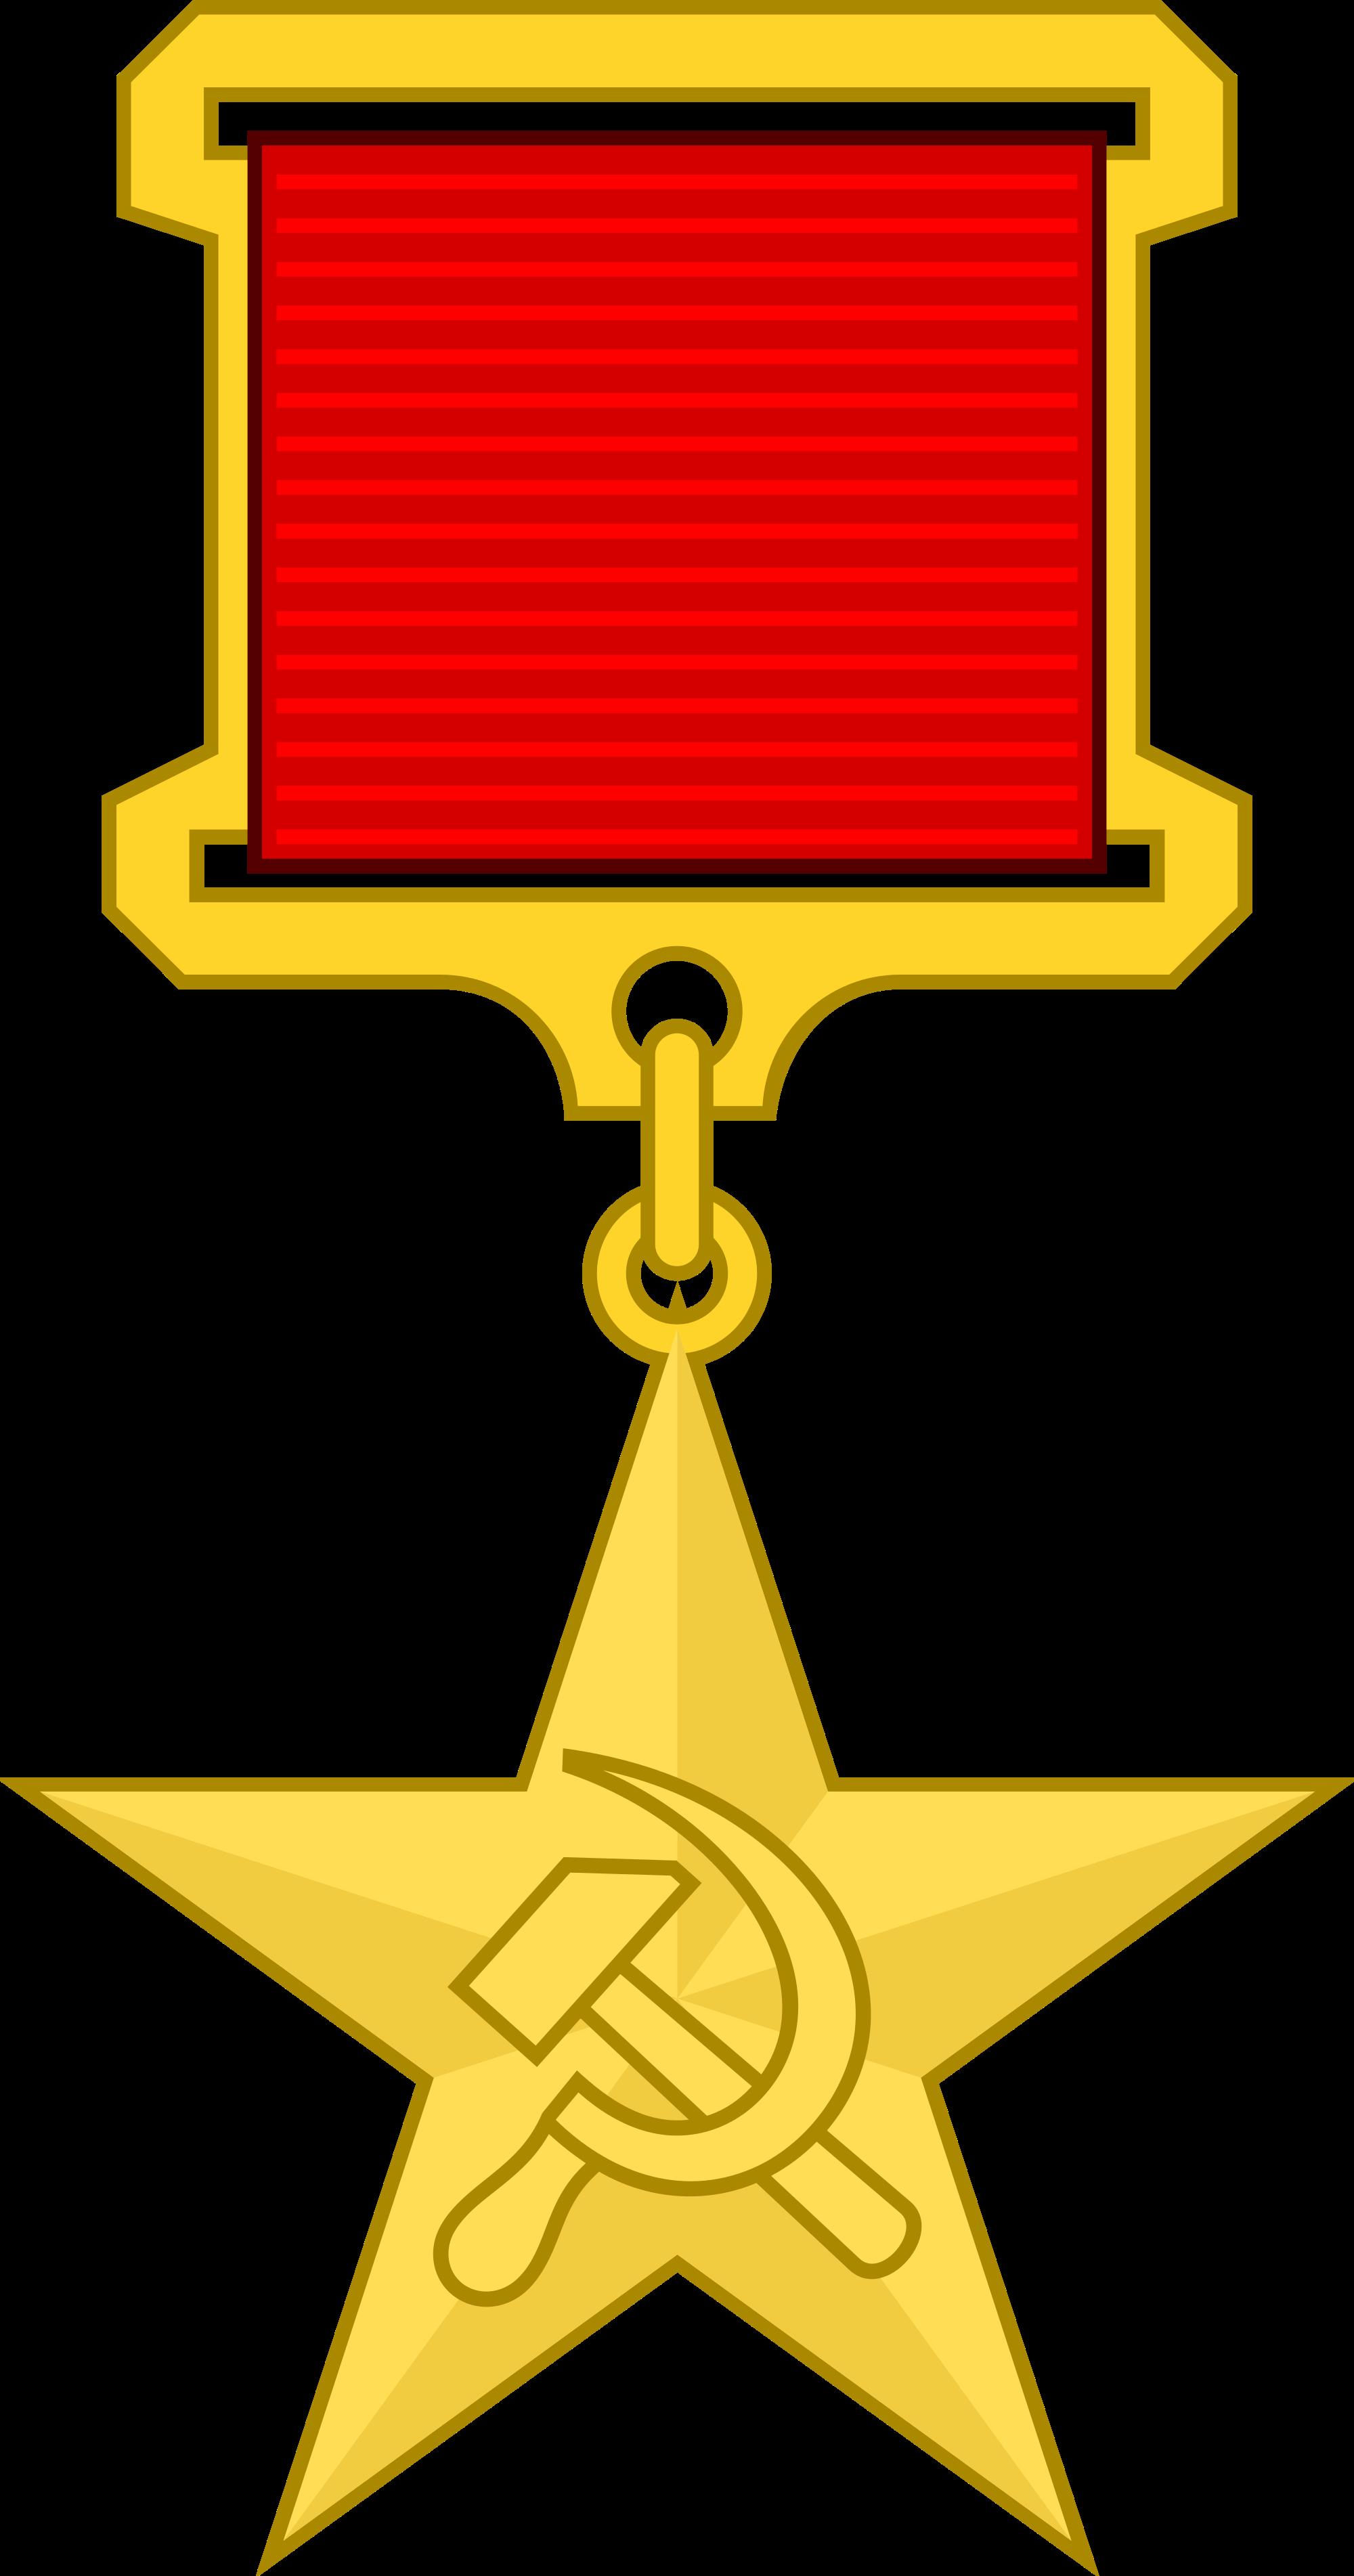 Hero clipart hero medal. File of socialist labor